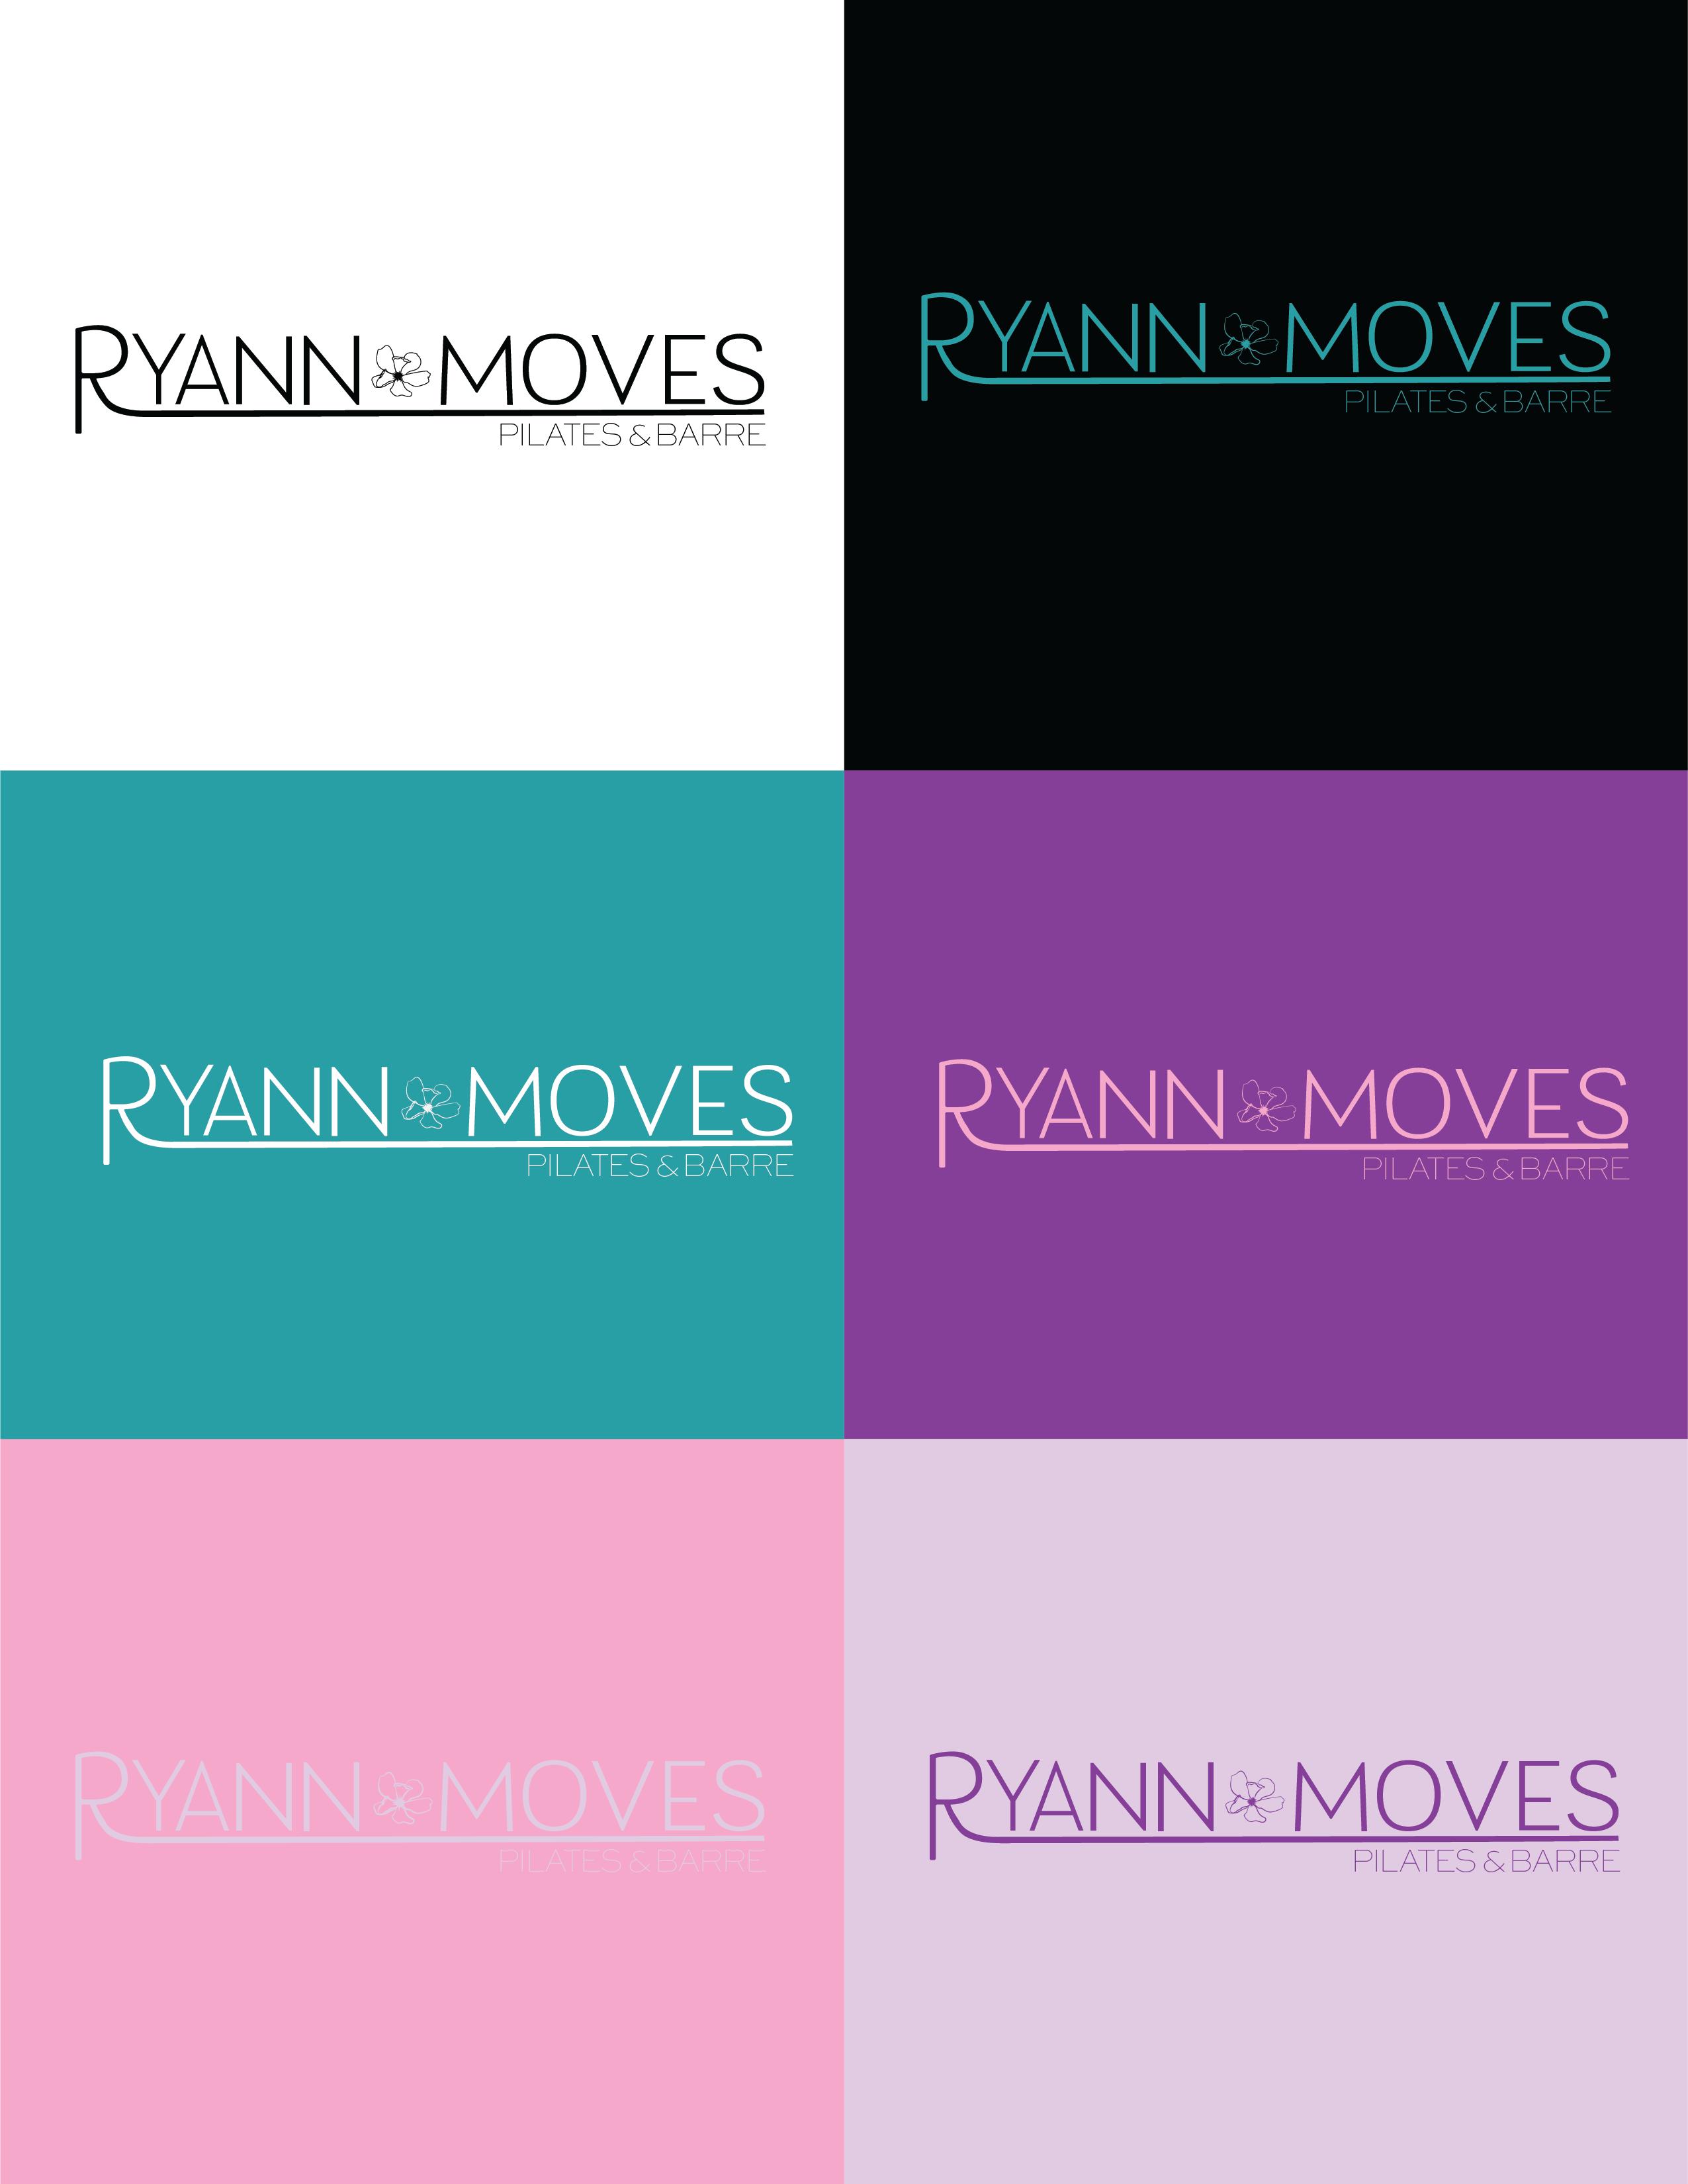 Ryann Moves